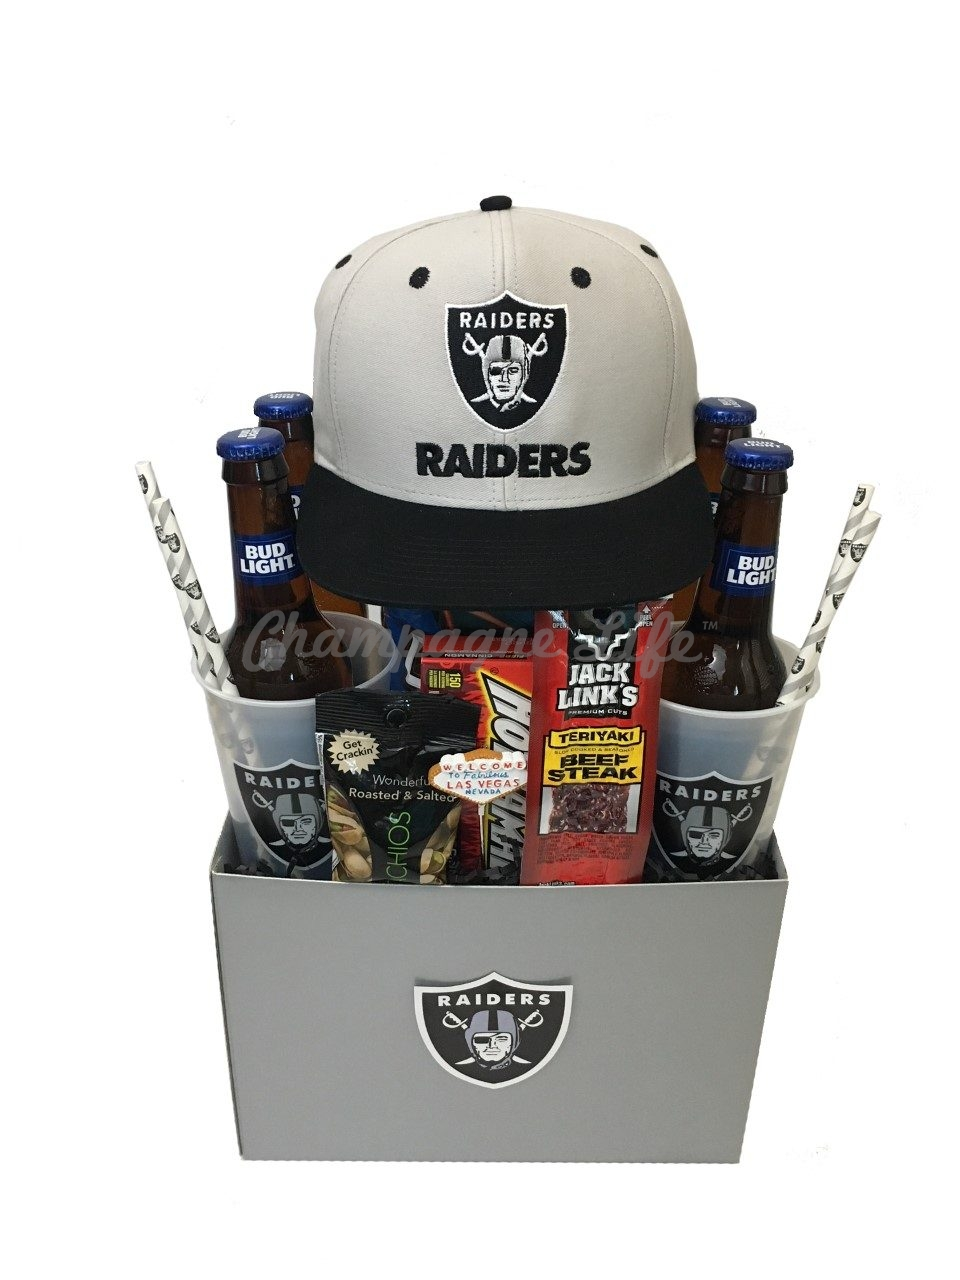 NFL Las Vegas Raiders Gift Basket Champagne Life Gift